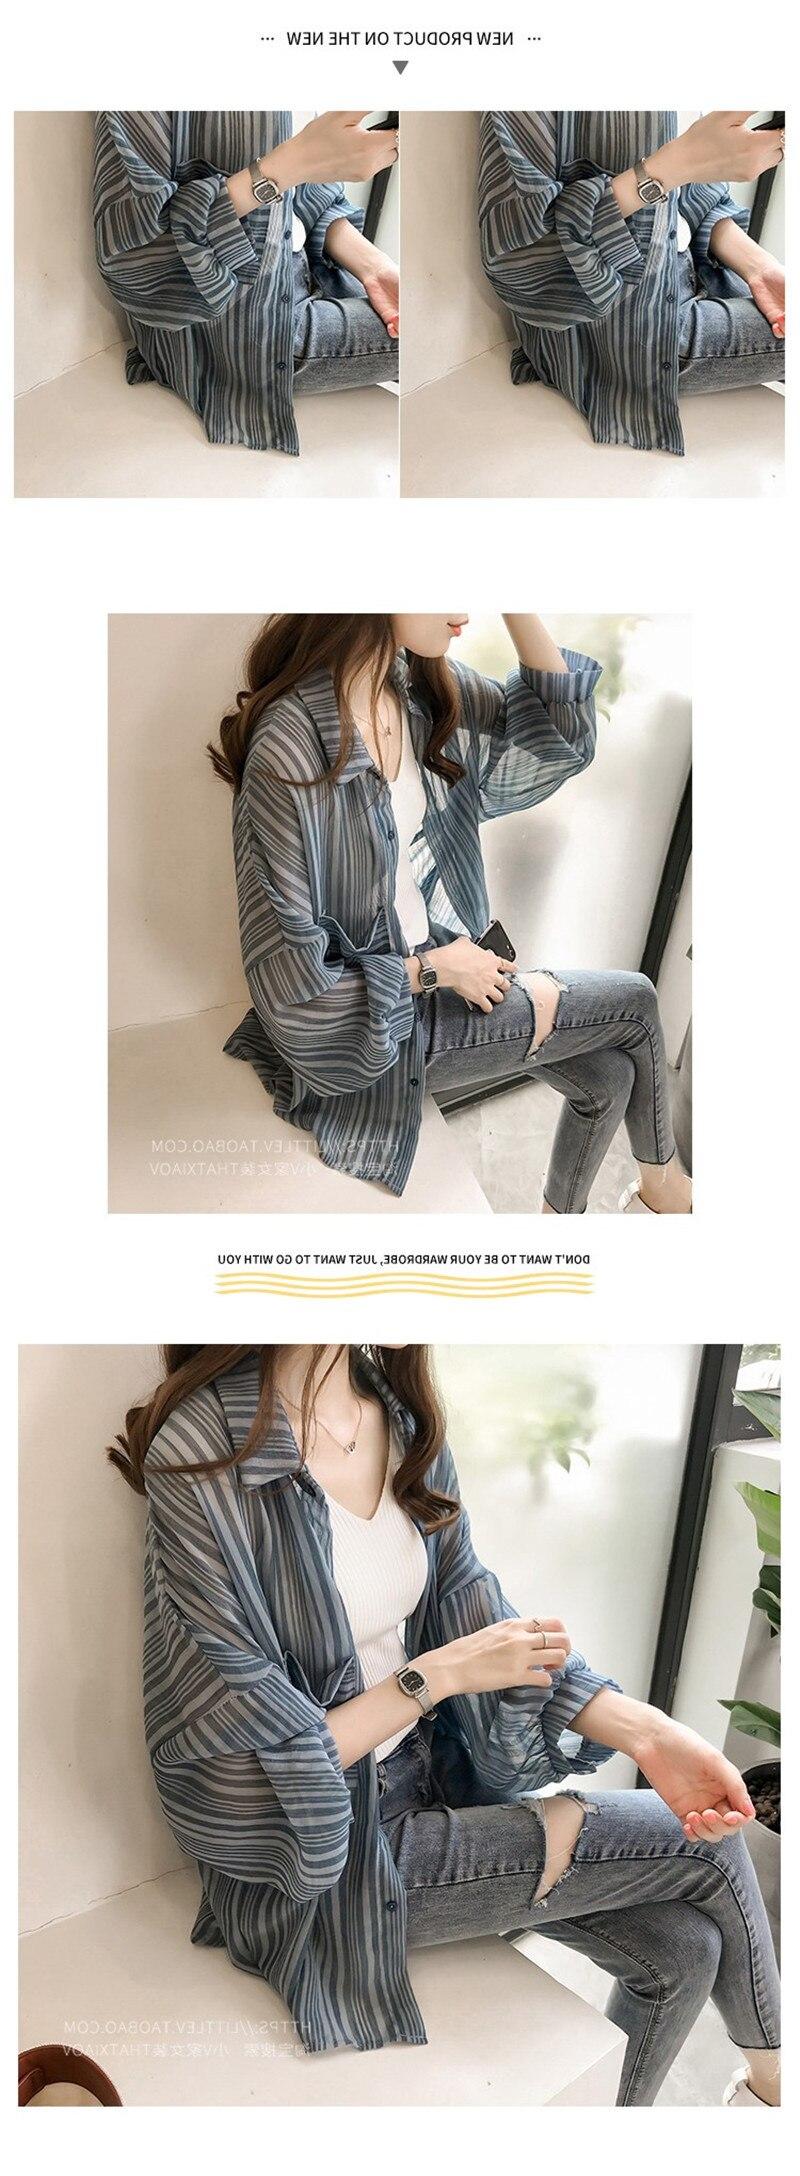 Summer Tops For Women 2019 Loose Lantern Sleeves Striped Shirt Female Chiffon Cardigan Wild Sun Protection Clothings (3)